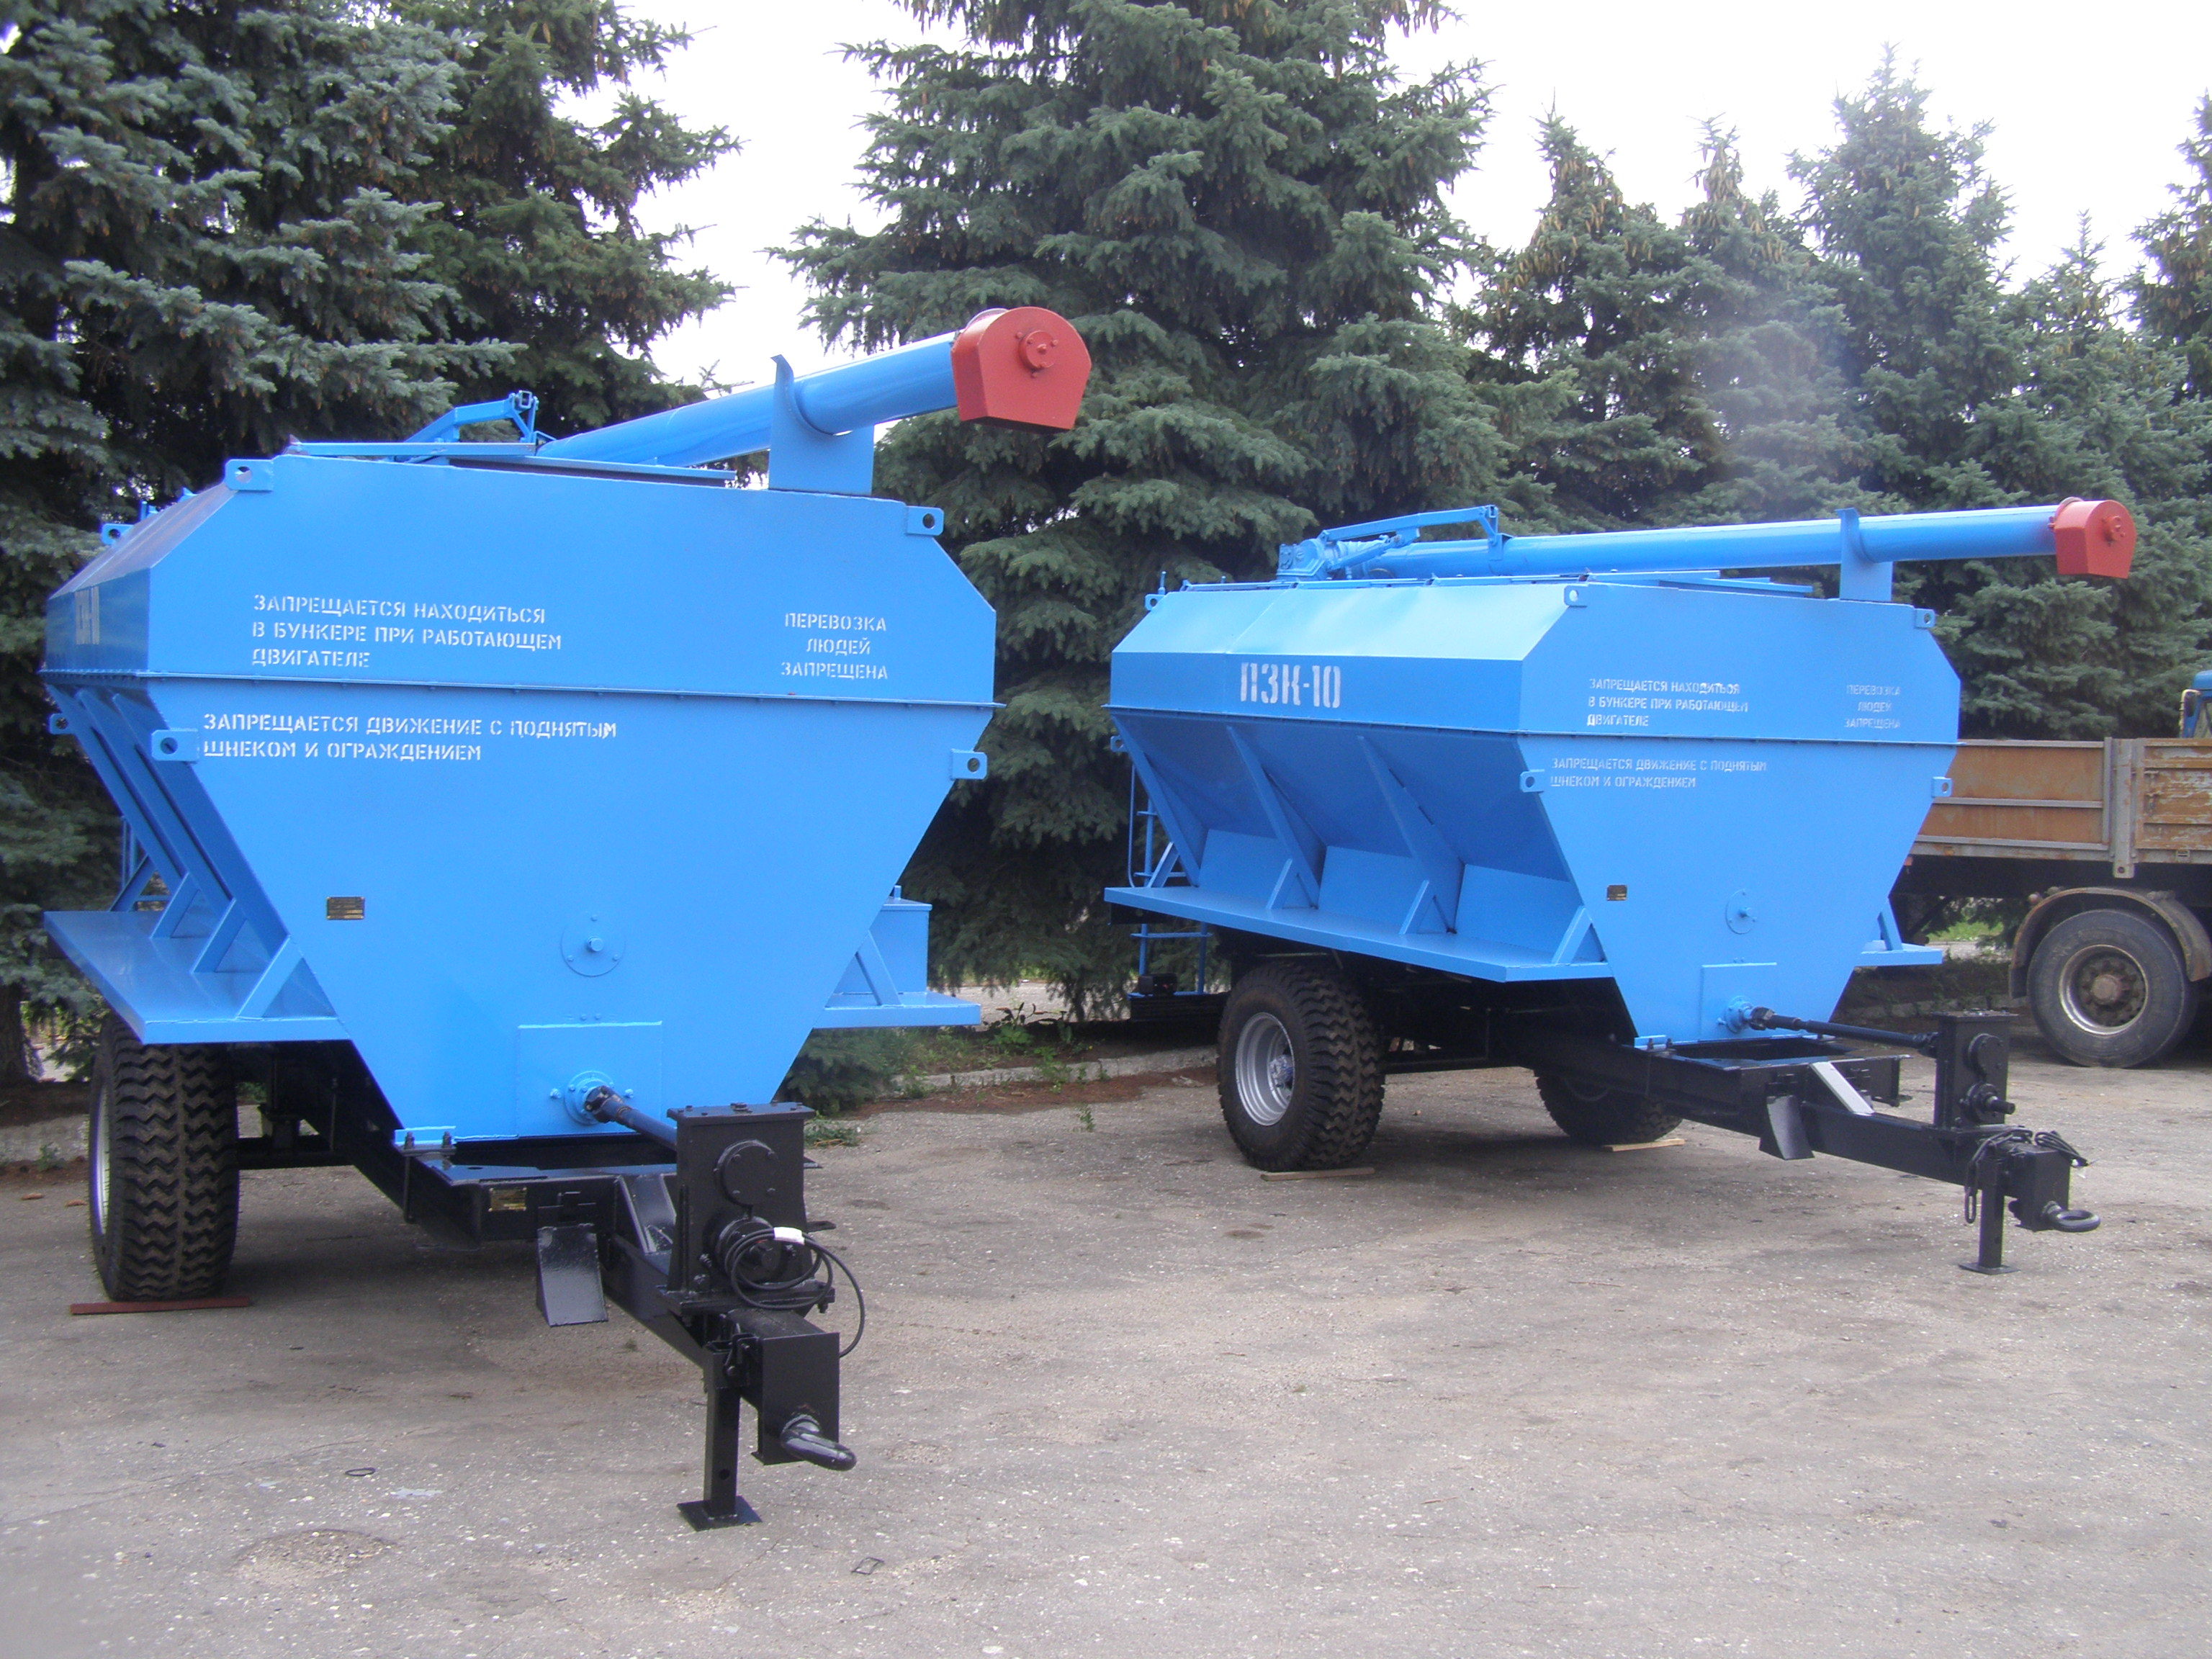 Загрузчик сухих кормов ПЗК-10